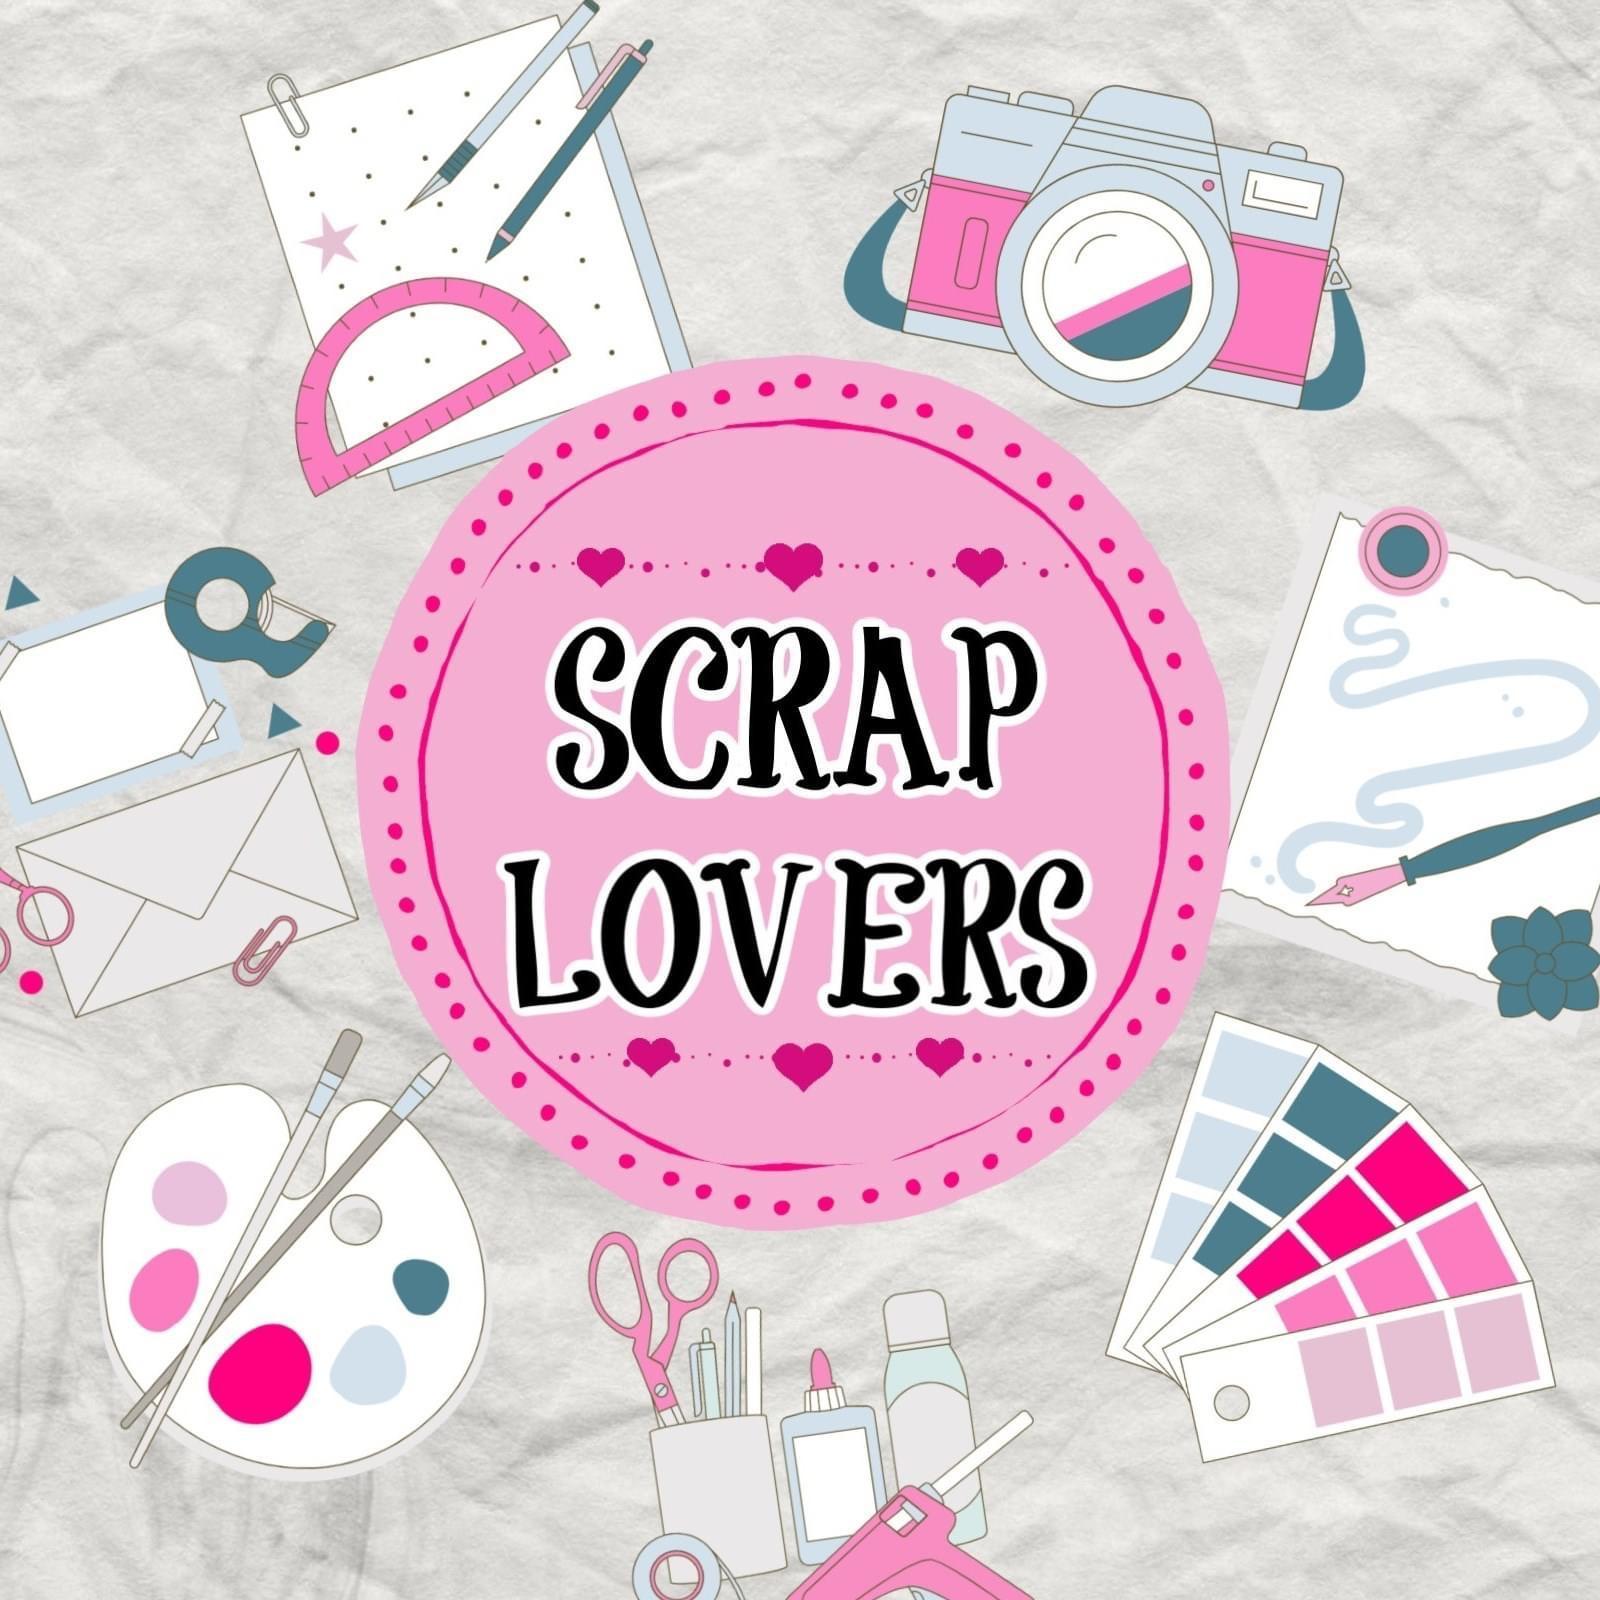 Scrap Lovers